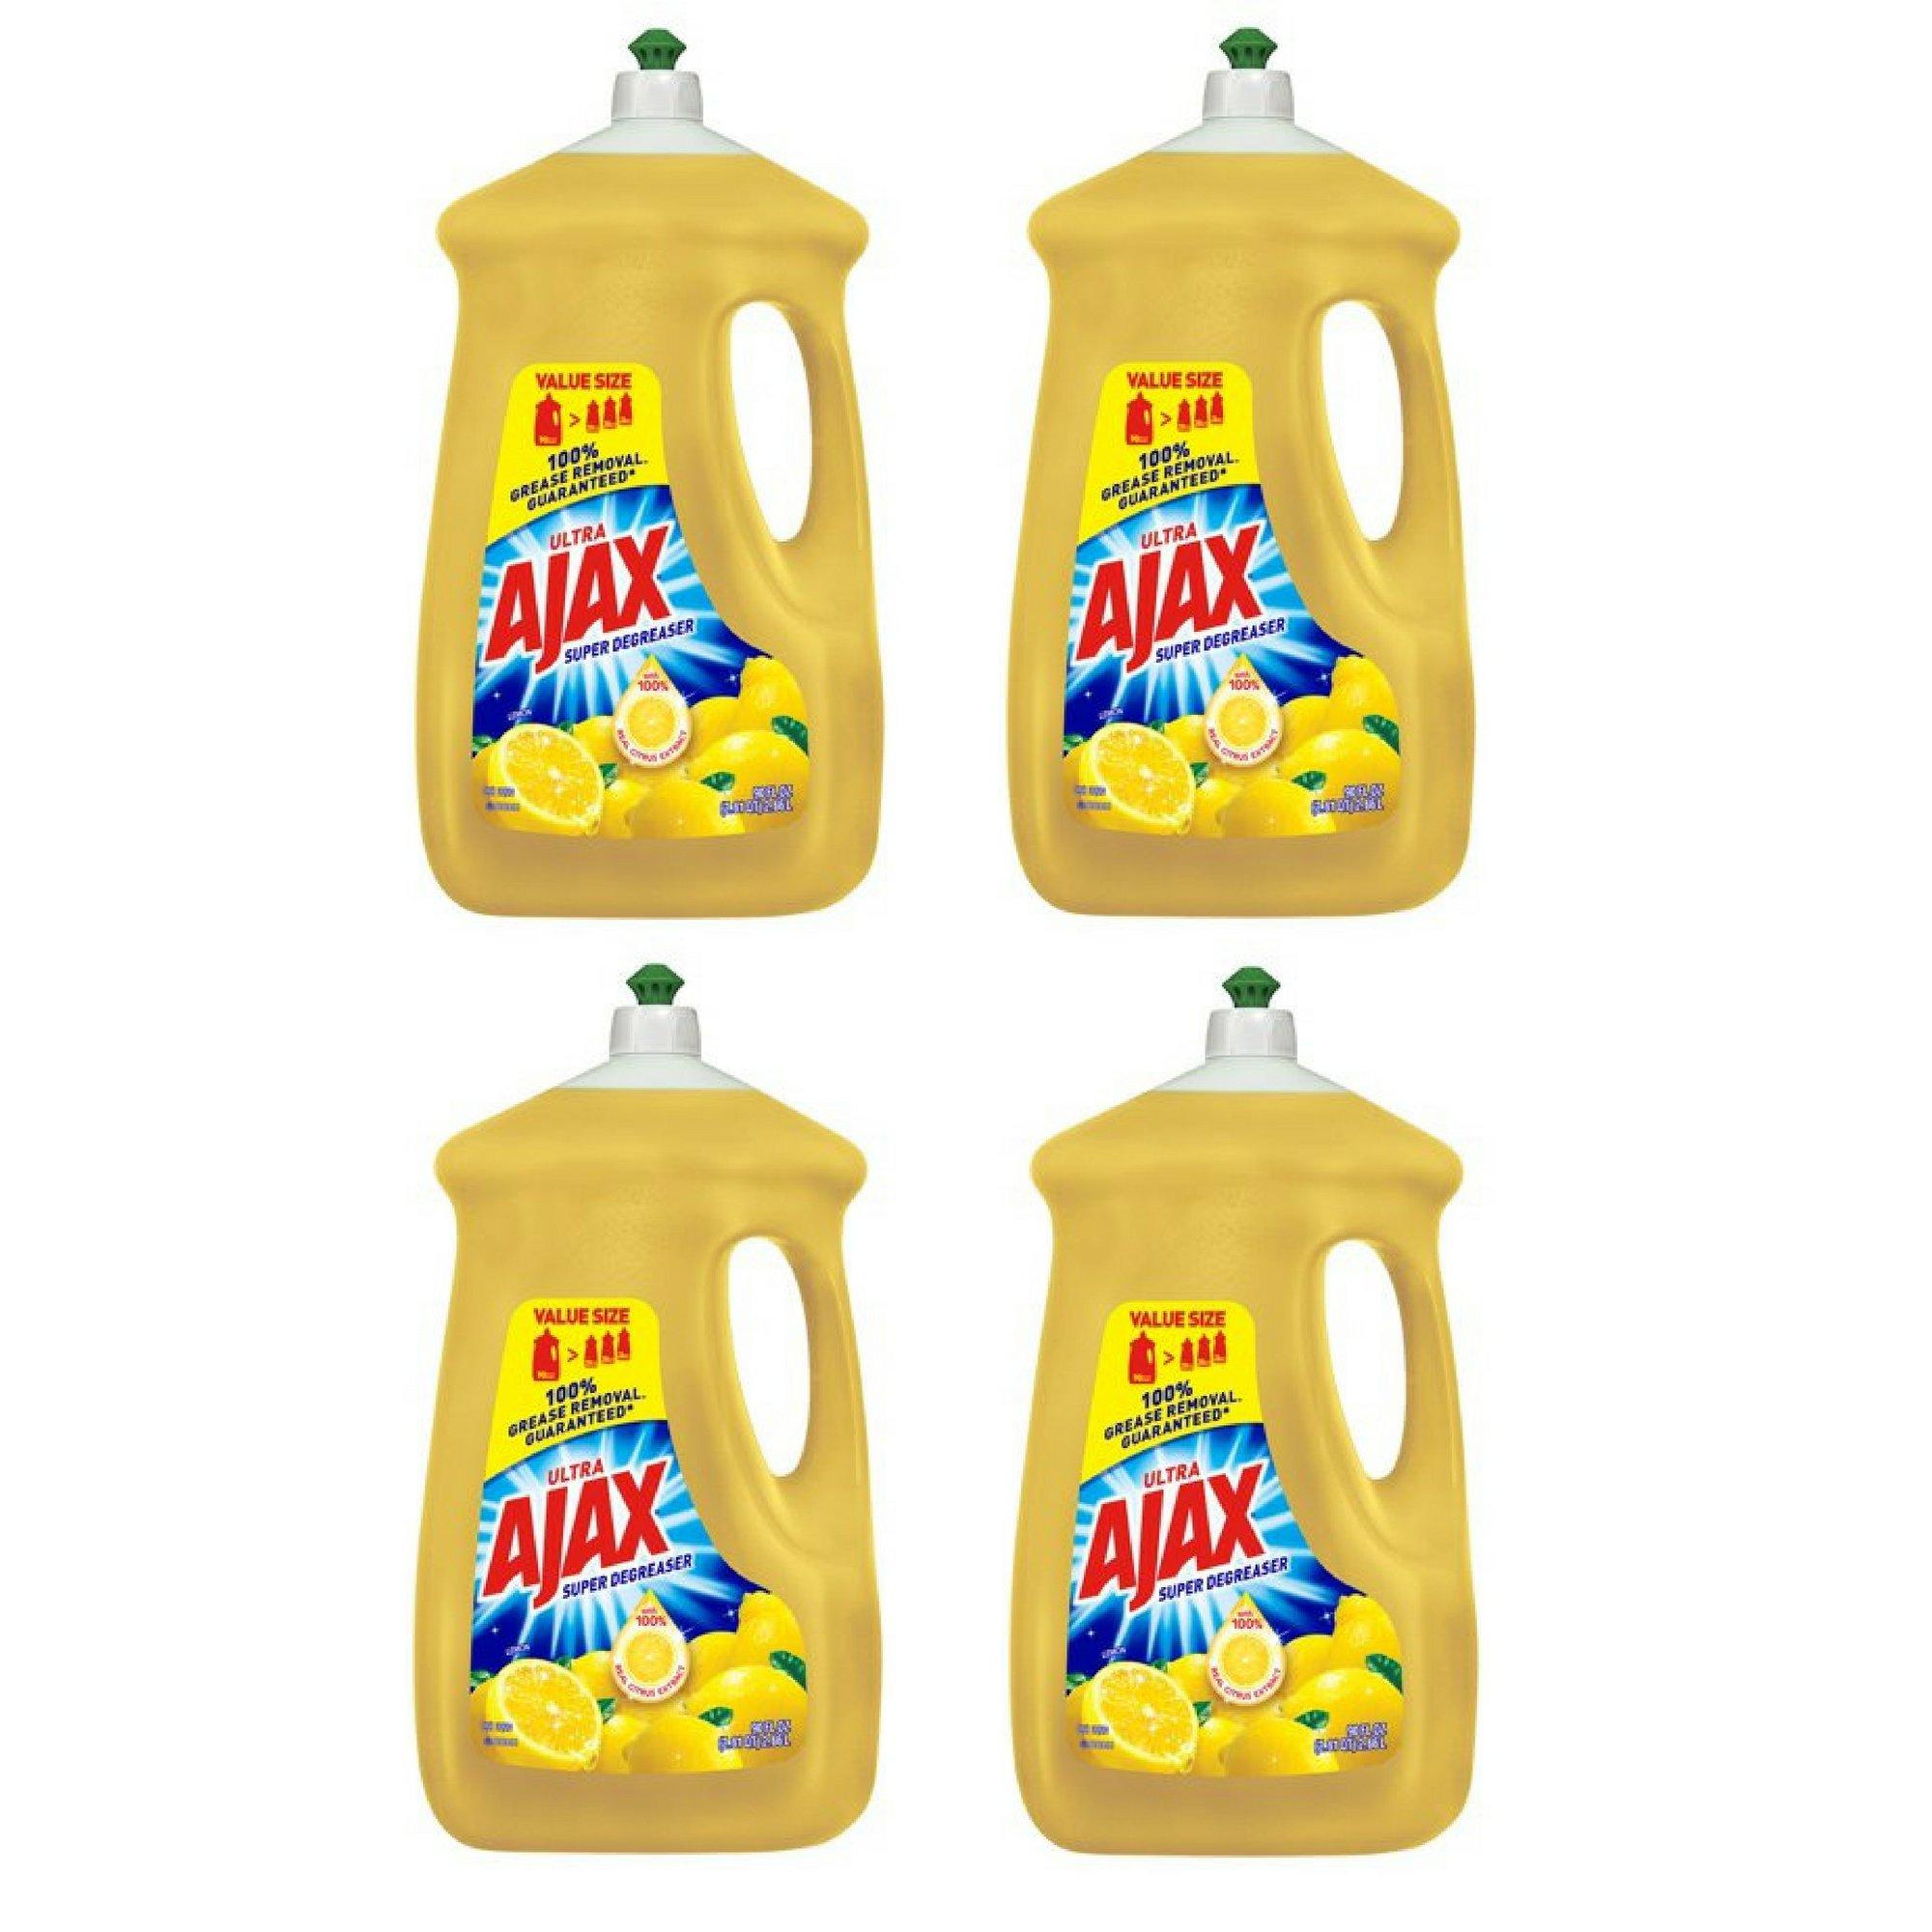 Ajax Ultra Triple Action Liquid Dish Soap, Lemon 90 fl oz - 4 Pack